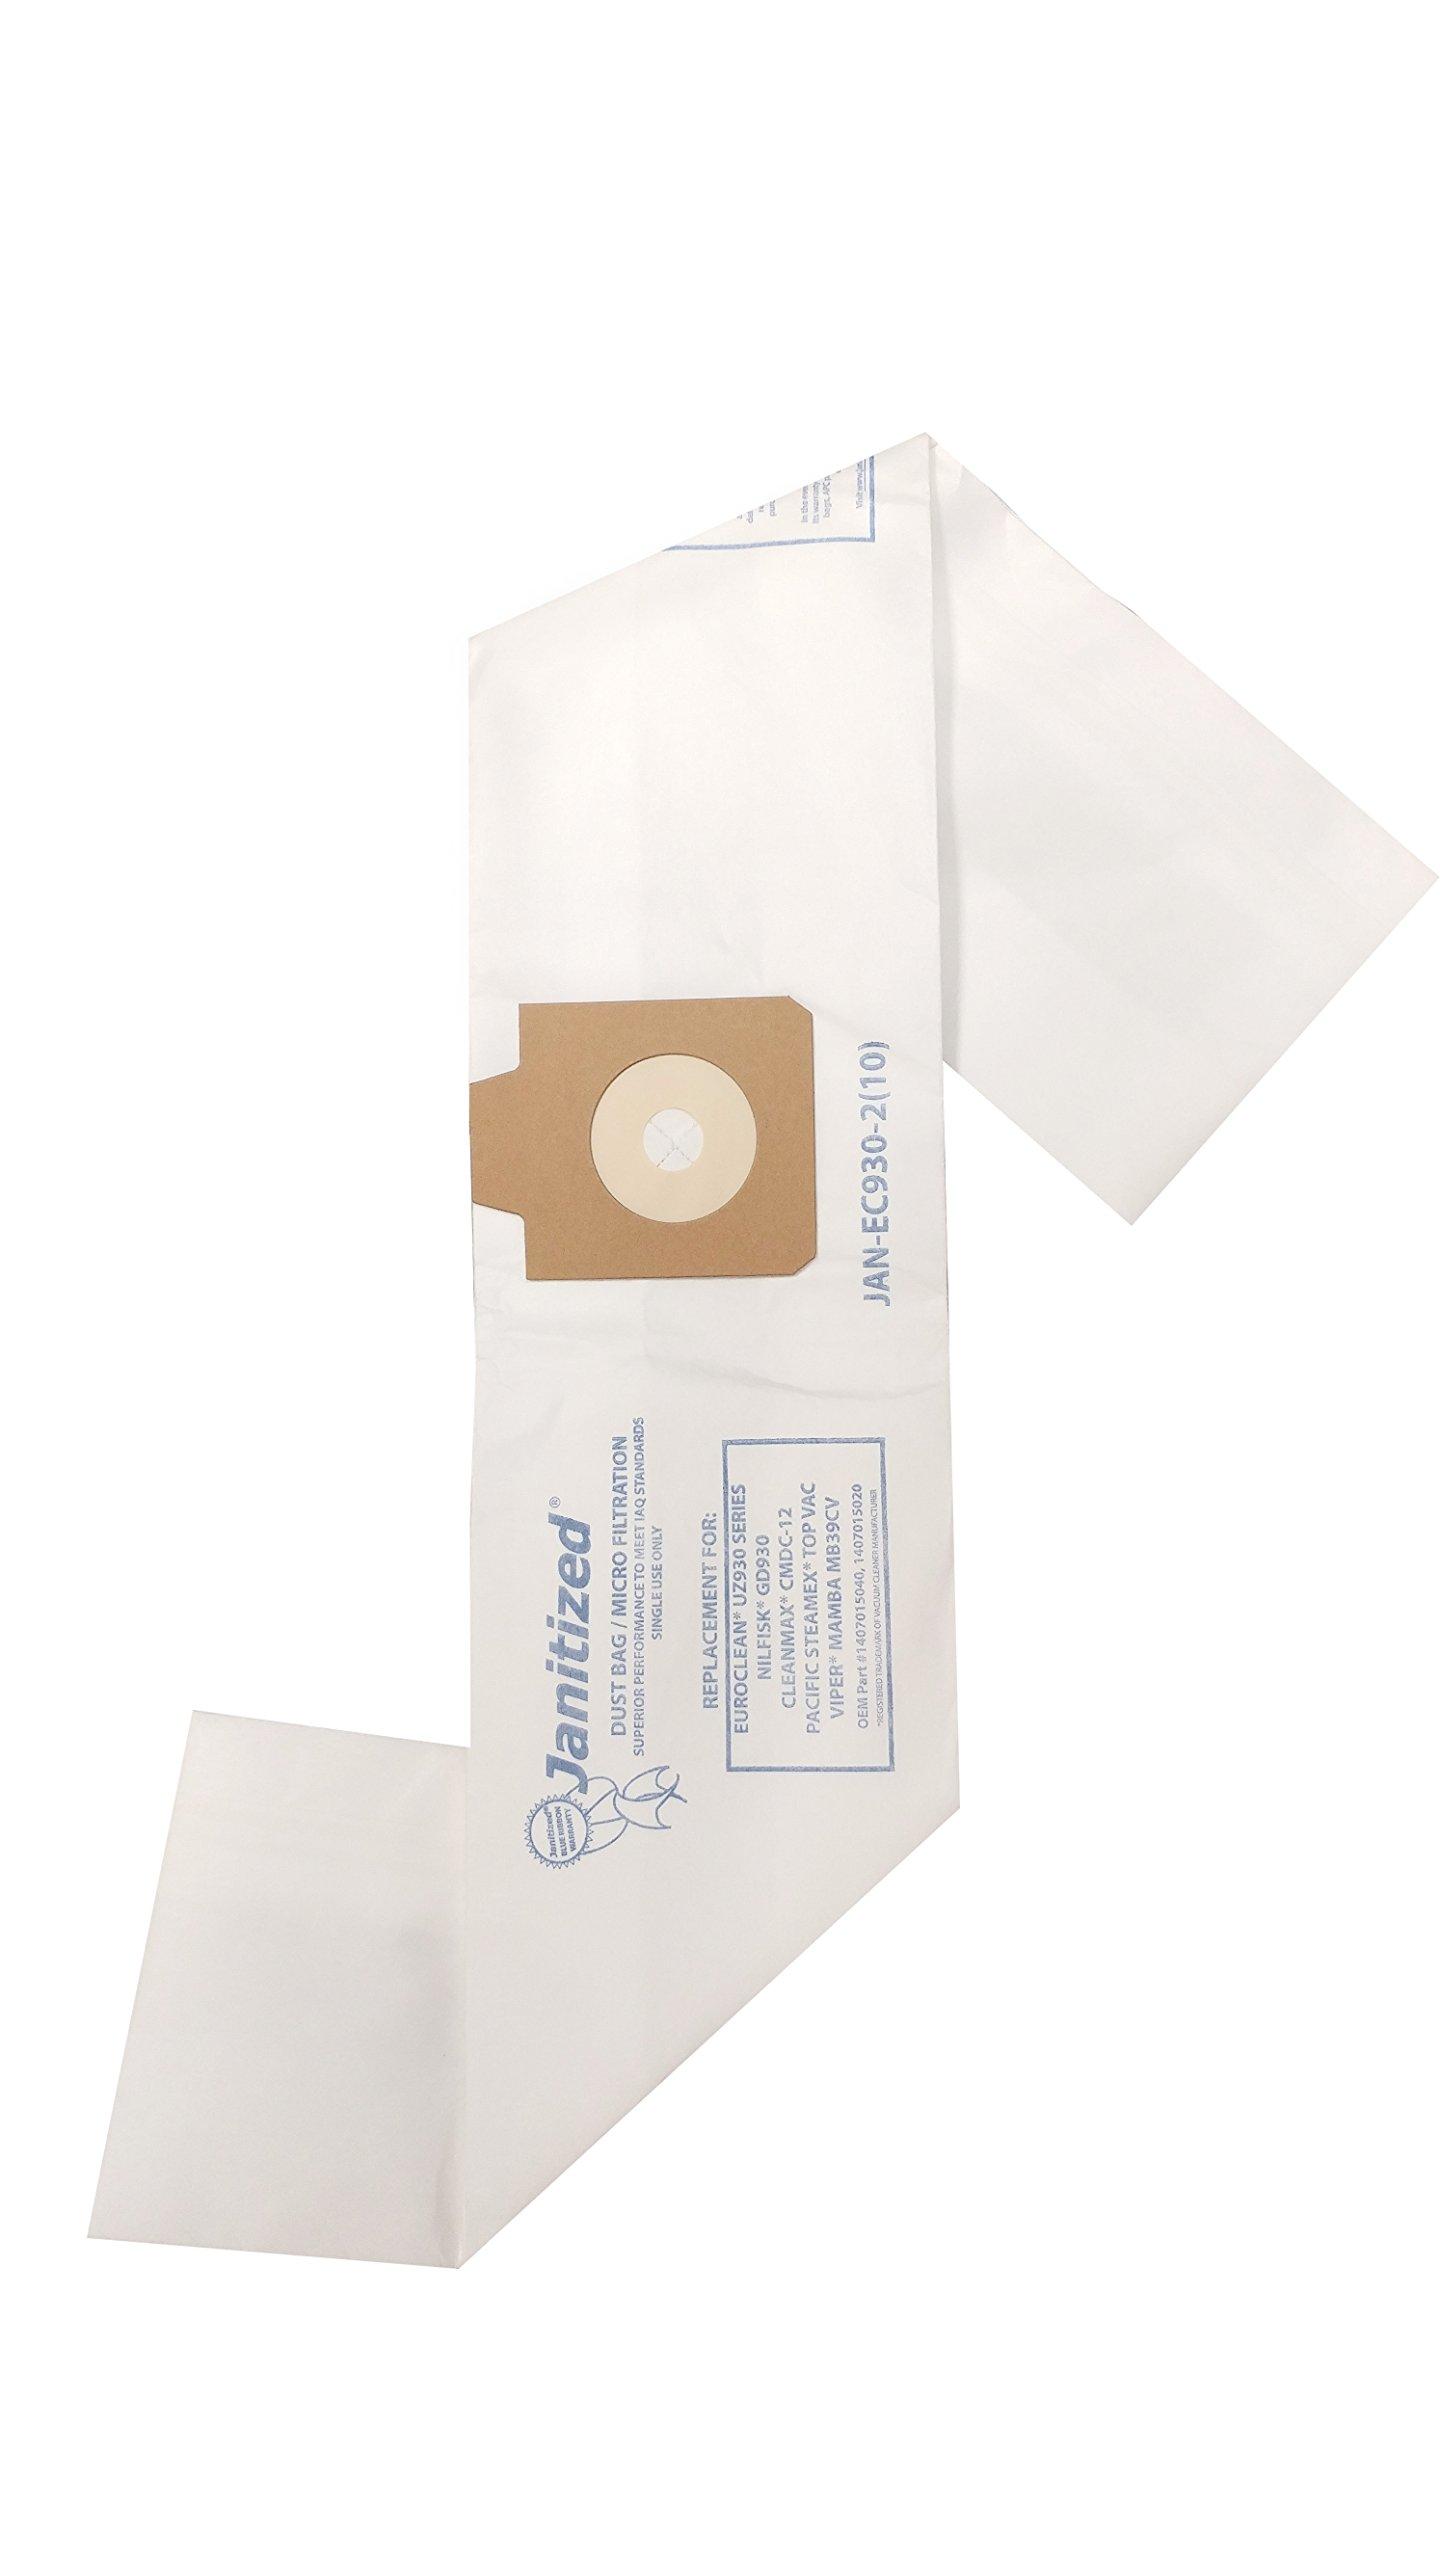 10 Karcher//Tornado PV10 Janitized JAN-KAPV10-2 69370 Premium Replacement Commercial Vacuum Paper Bag Power-Flite PF1000BP OEM#B352-7800 Sanitaire SC420A Tennant V-BP-10 Pack of 10 87537